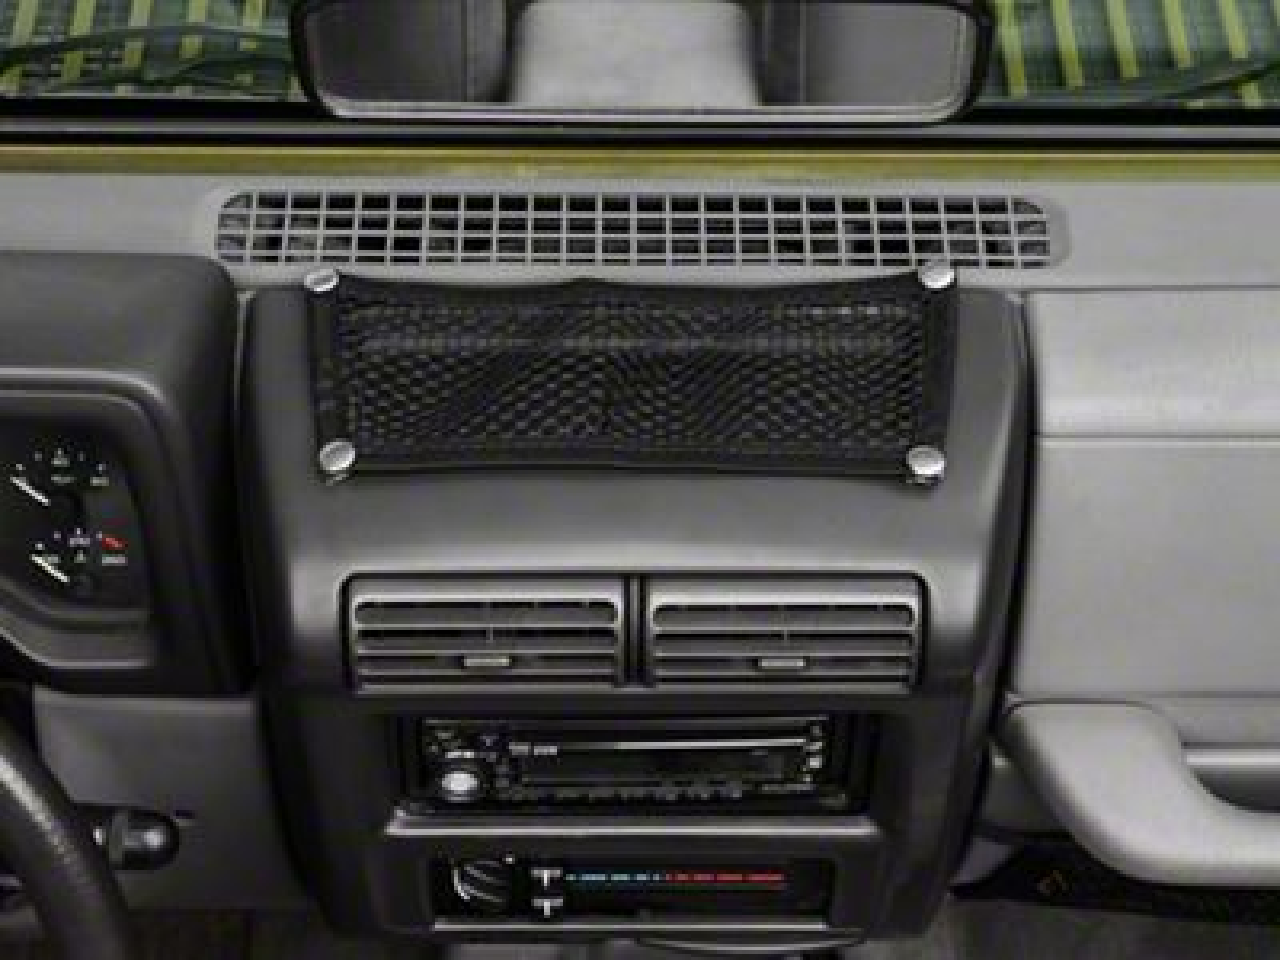 Rugged Ridge Jeep Wrangler Black 5 Piece Interior Mesh Storage Net Kit 12495 11 97 06 Jeep Wrangler Tj